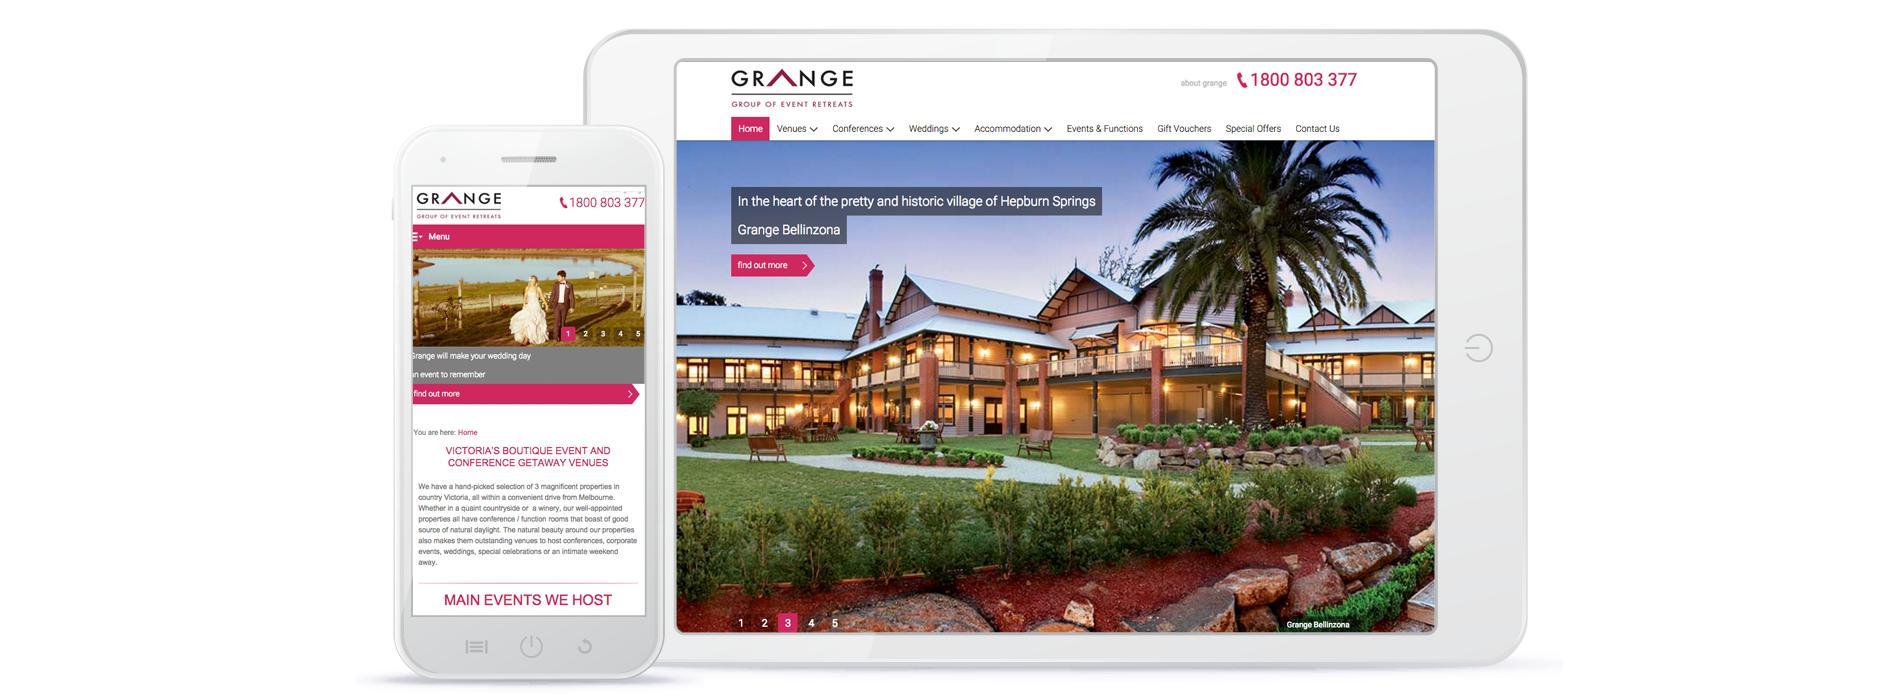 grange-screens